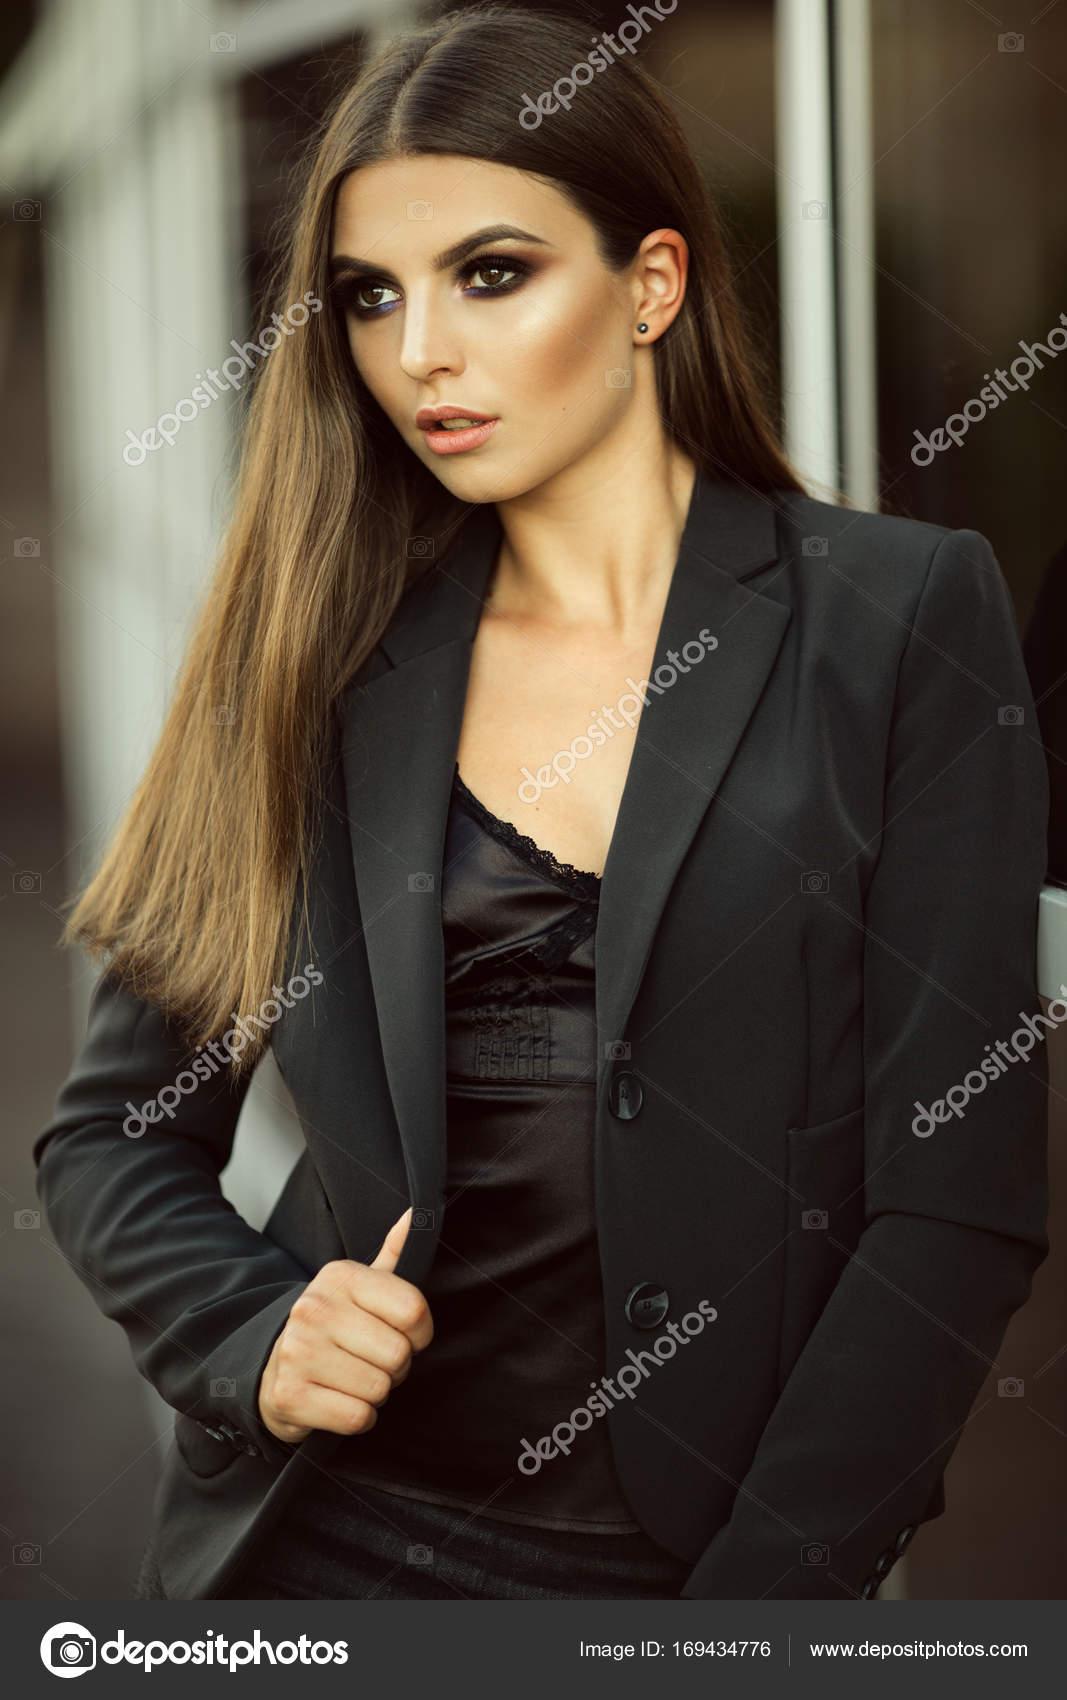 a7e7e9e68ea5 Πορτραίτο κοριτσιού σοβαρή επιχείρηση μόδας φοράει μαύρα επίσημα ρούχα κοντά  σε μεγάλα γυάλινα παράθυρα — Φωτογραφία